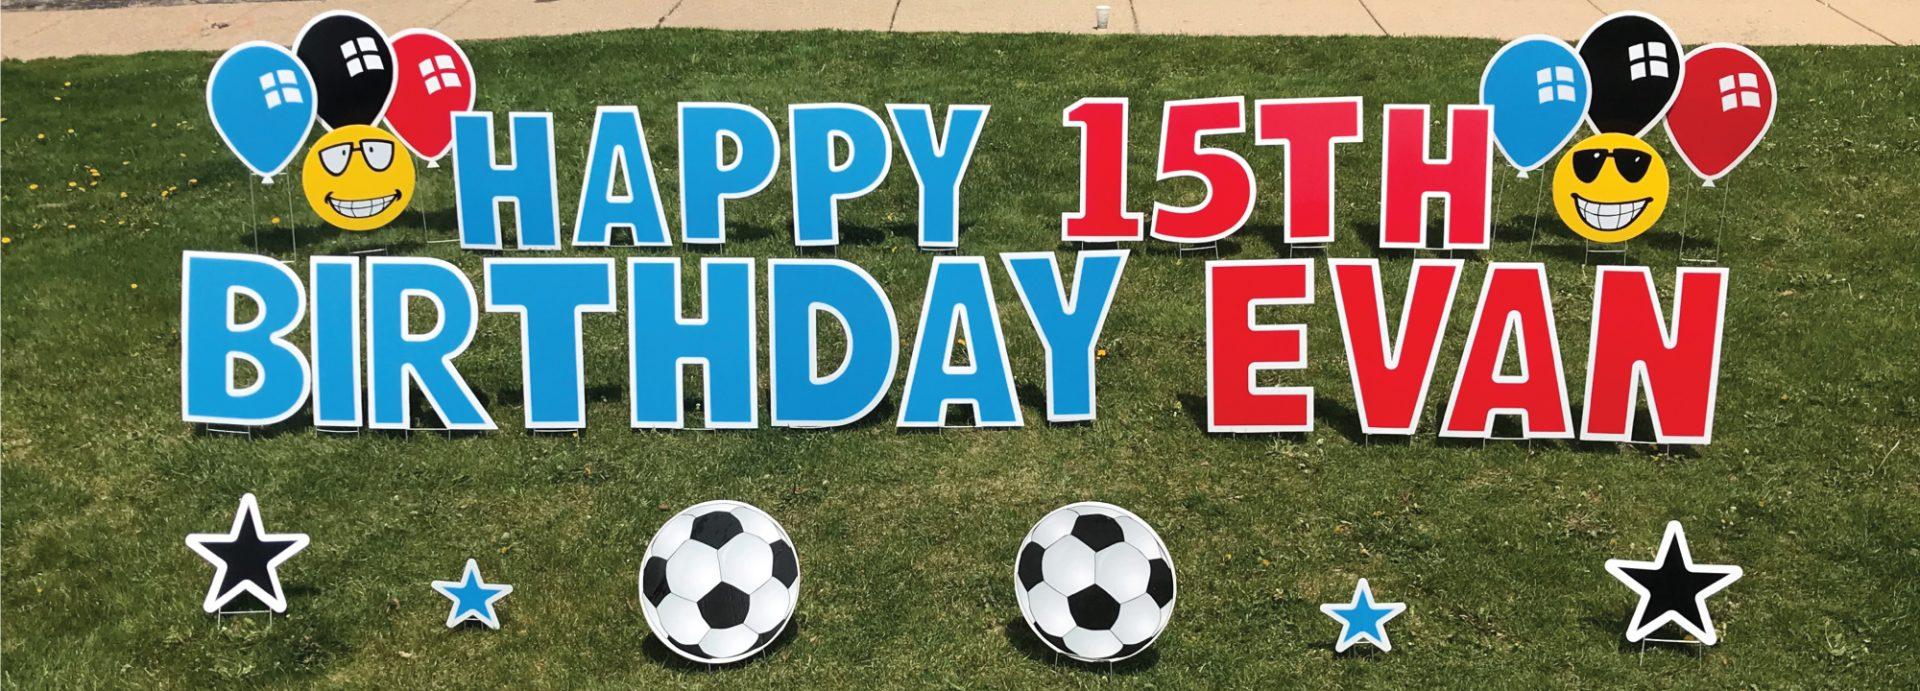 Yard Greeting soccer balls slider happy birthday